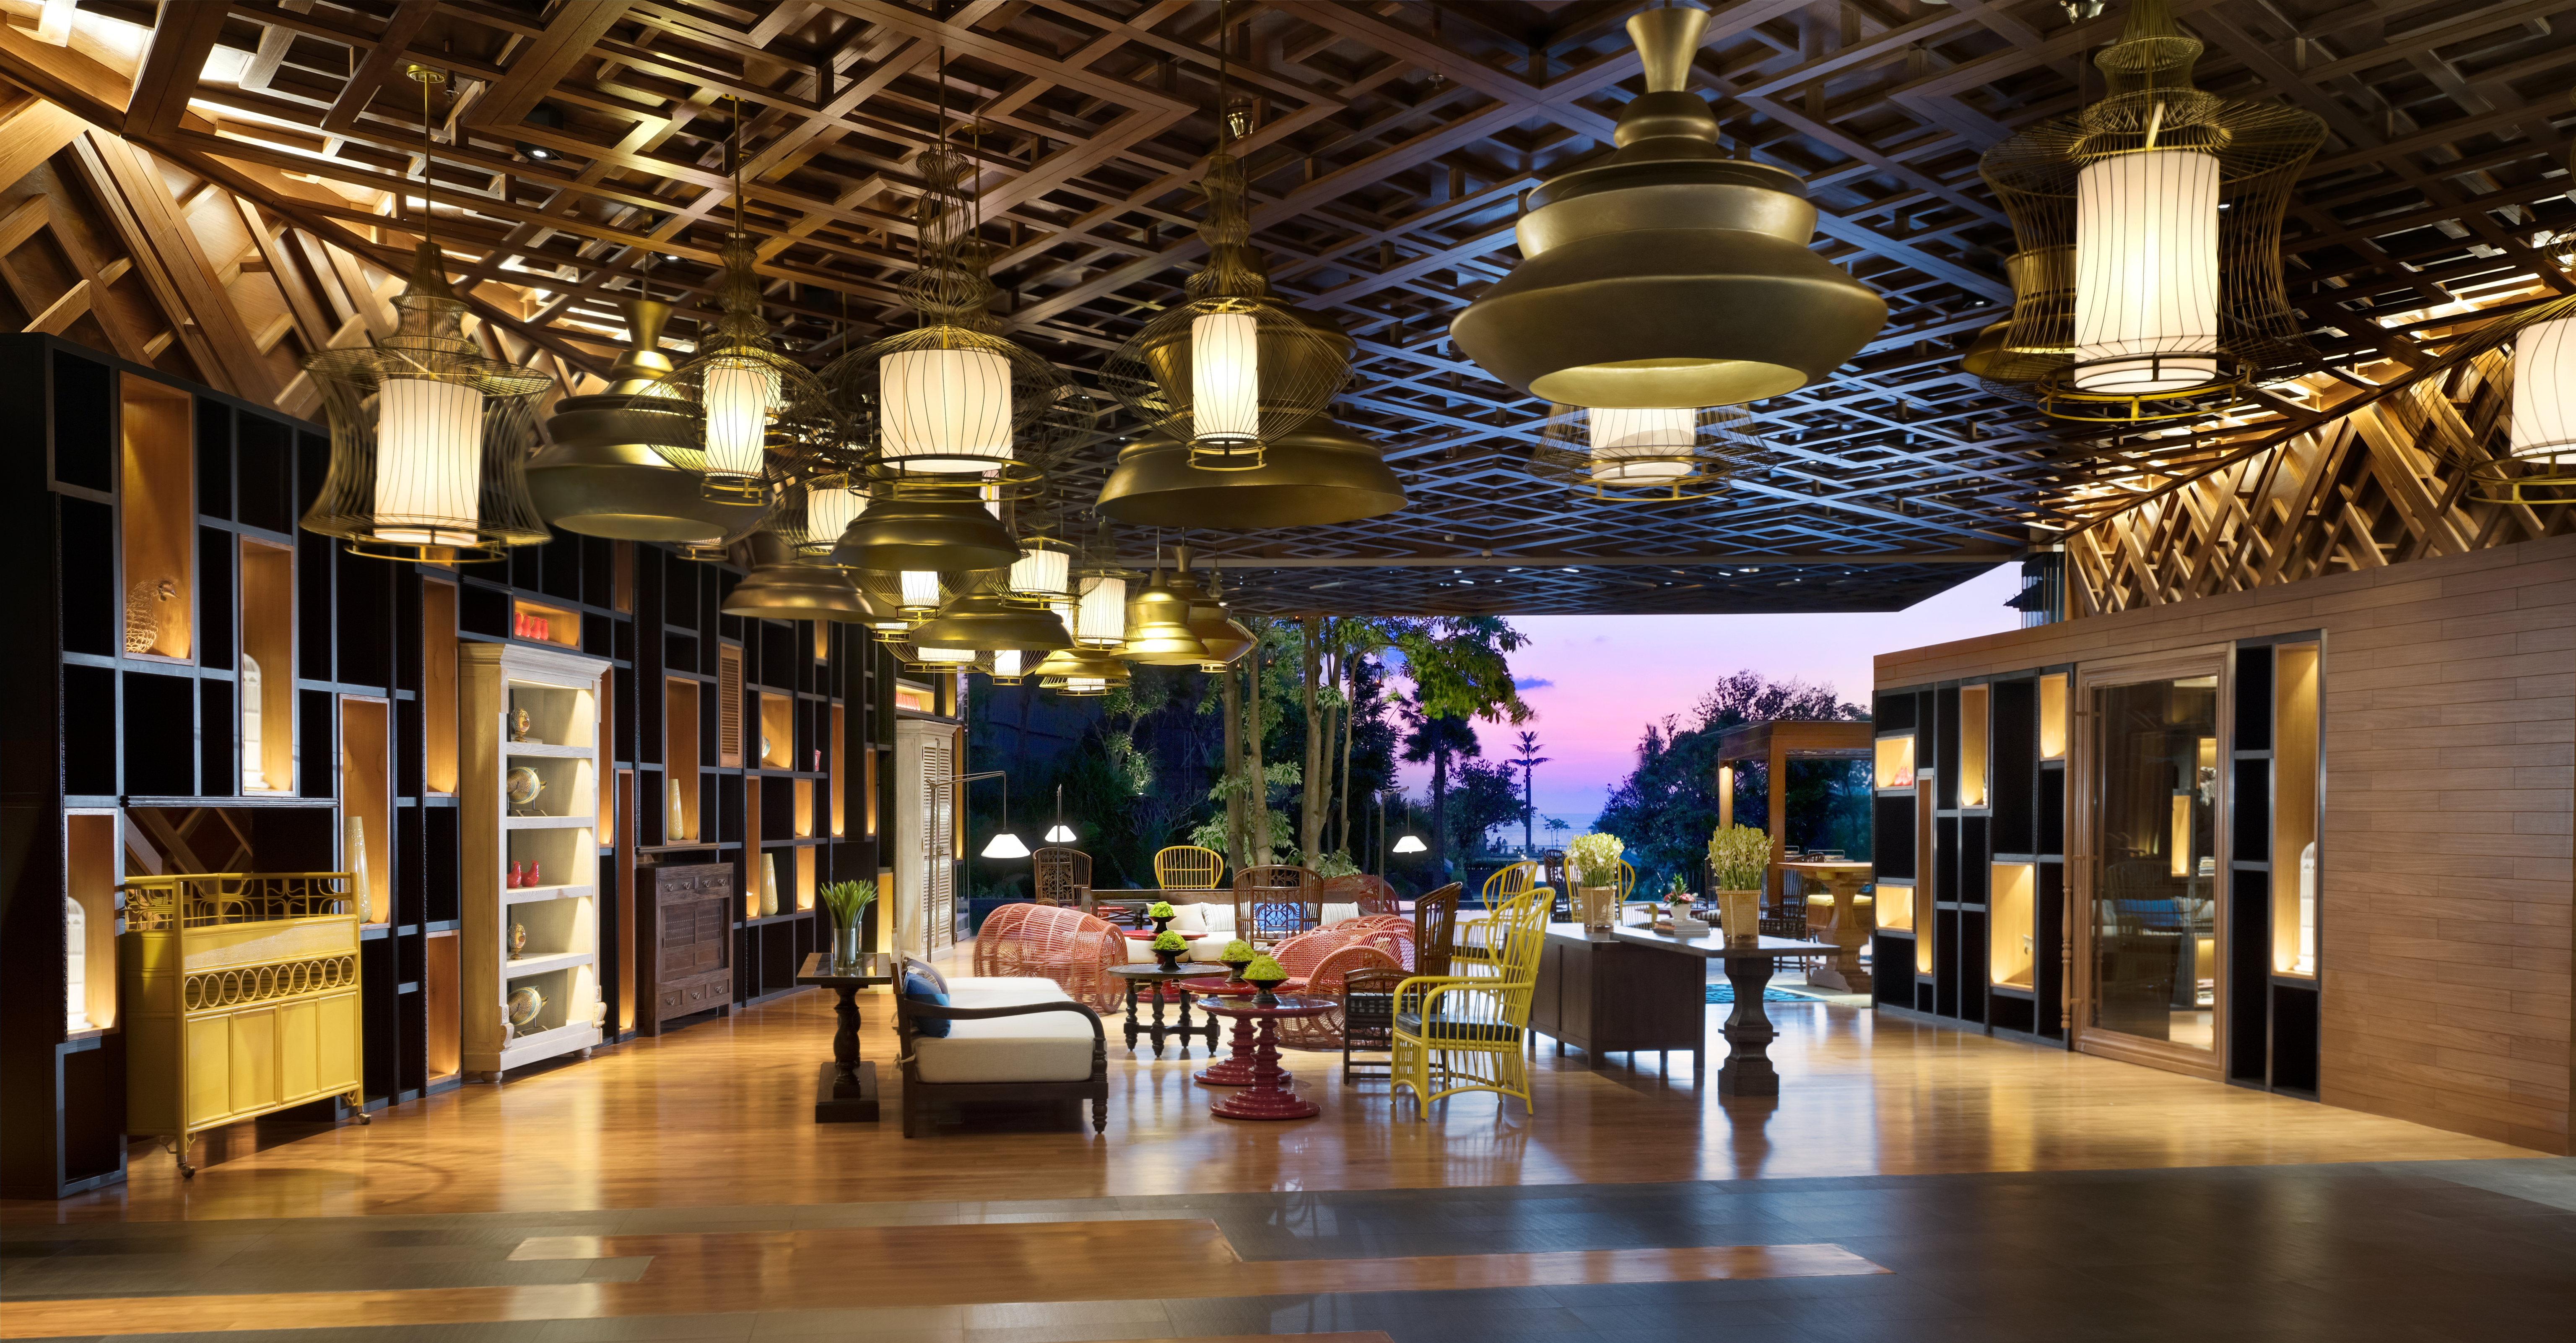 Indigo Bali Seminyak,英迪格渡假飯店,住宿體驗密技大公開 @飯糰五號的旅遊狂想+